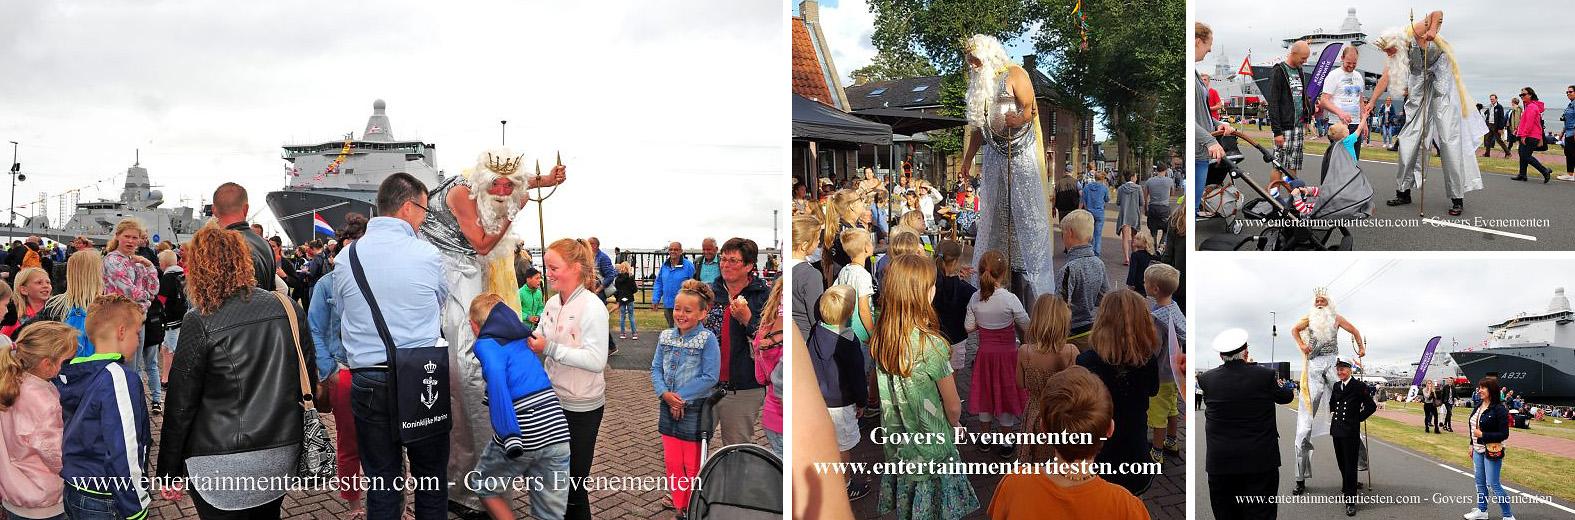 Nautisch- & Maritiem Entertainment, Neptunus op stelten - steltenloper voor themafeesten en festivals stelten act steltentheater, Govers Evenementen, www.goversartiesten.nl